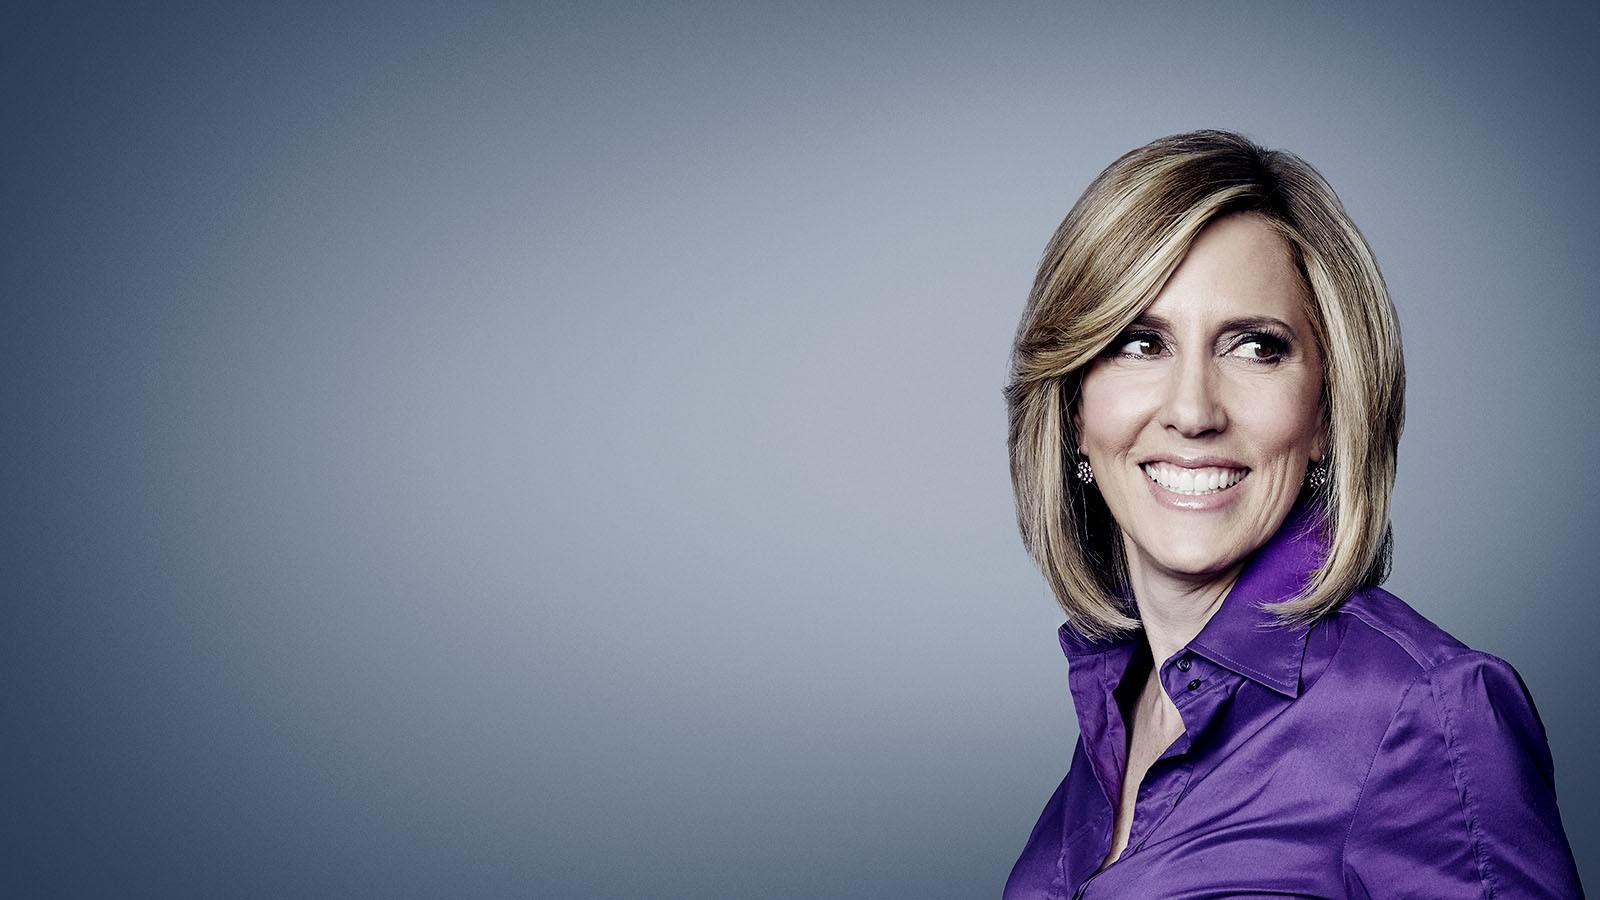 CNN anchor Fredricka Whitfield to speak April 5 | UAPB News |Cnn Morning News Anchors